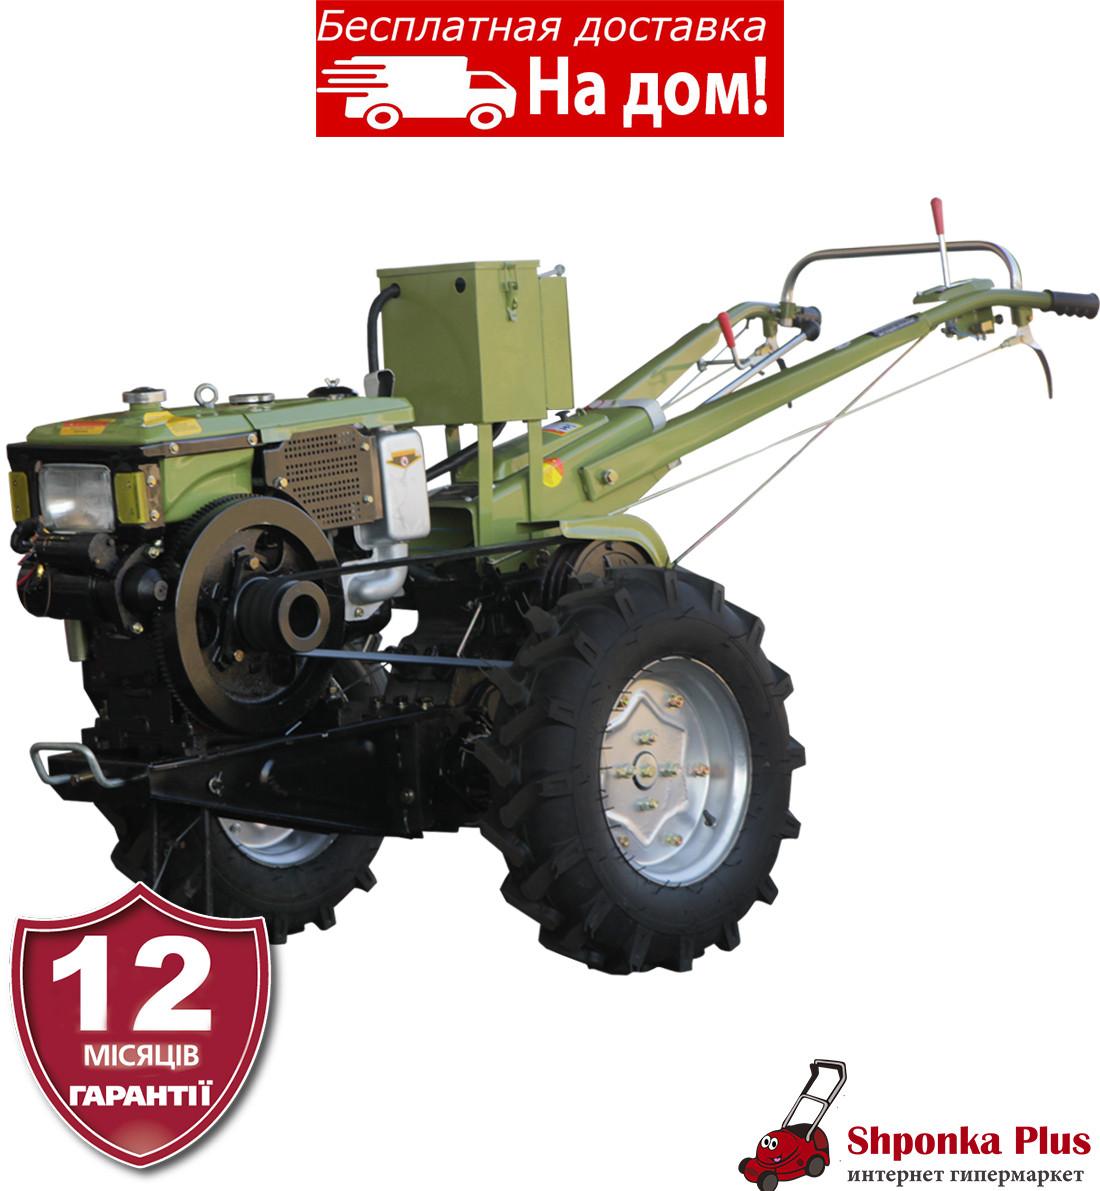 Мотоблок 10л.с., без фрезы, электростартер, Кентавр МБ 1010Е